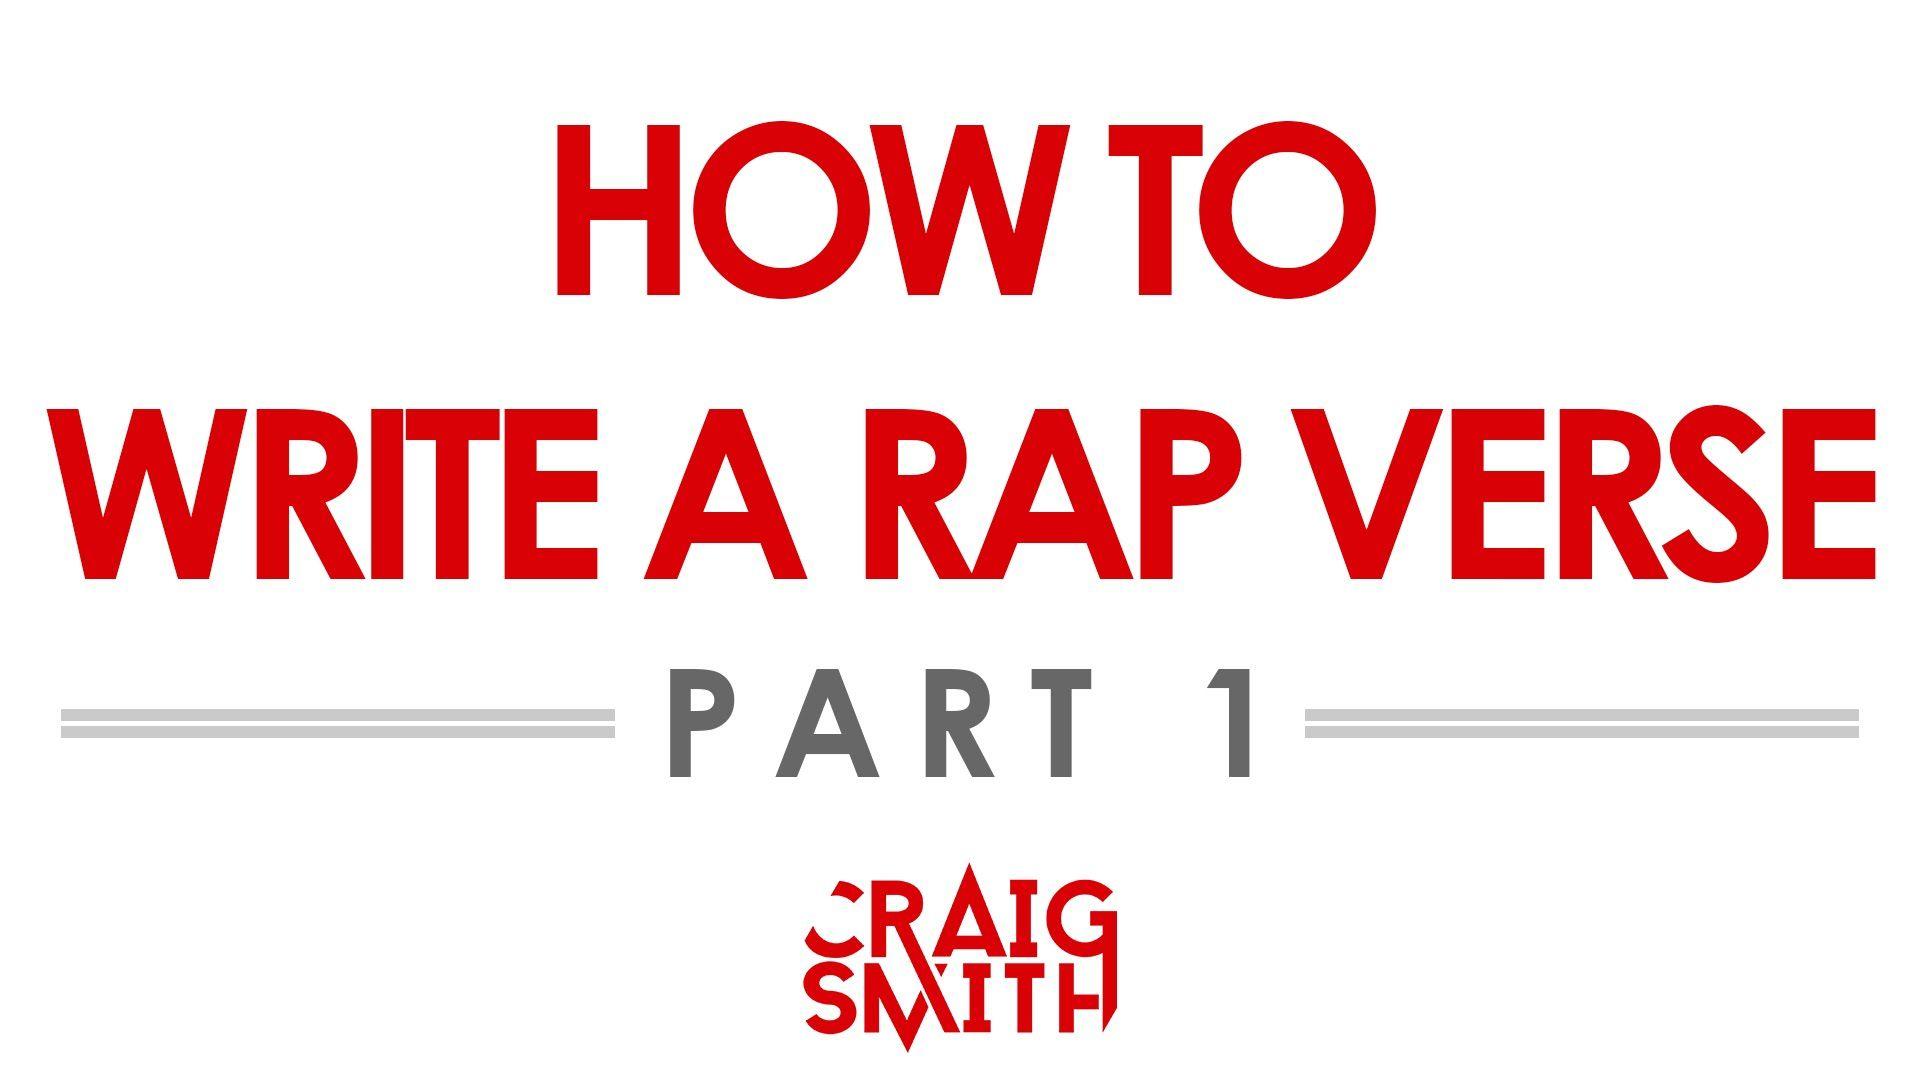 How To Write A Rap Verse (Pt 1) Rap verses, Writing, Rap